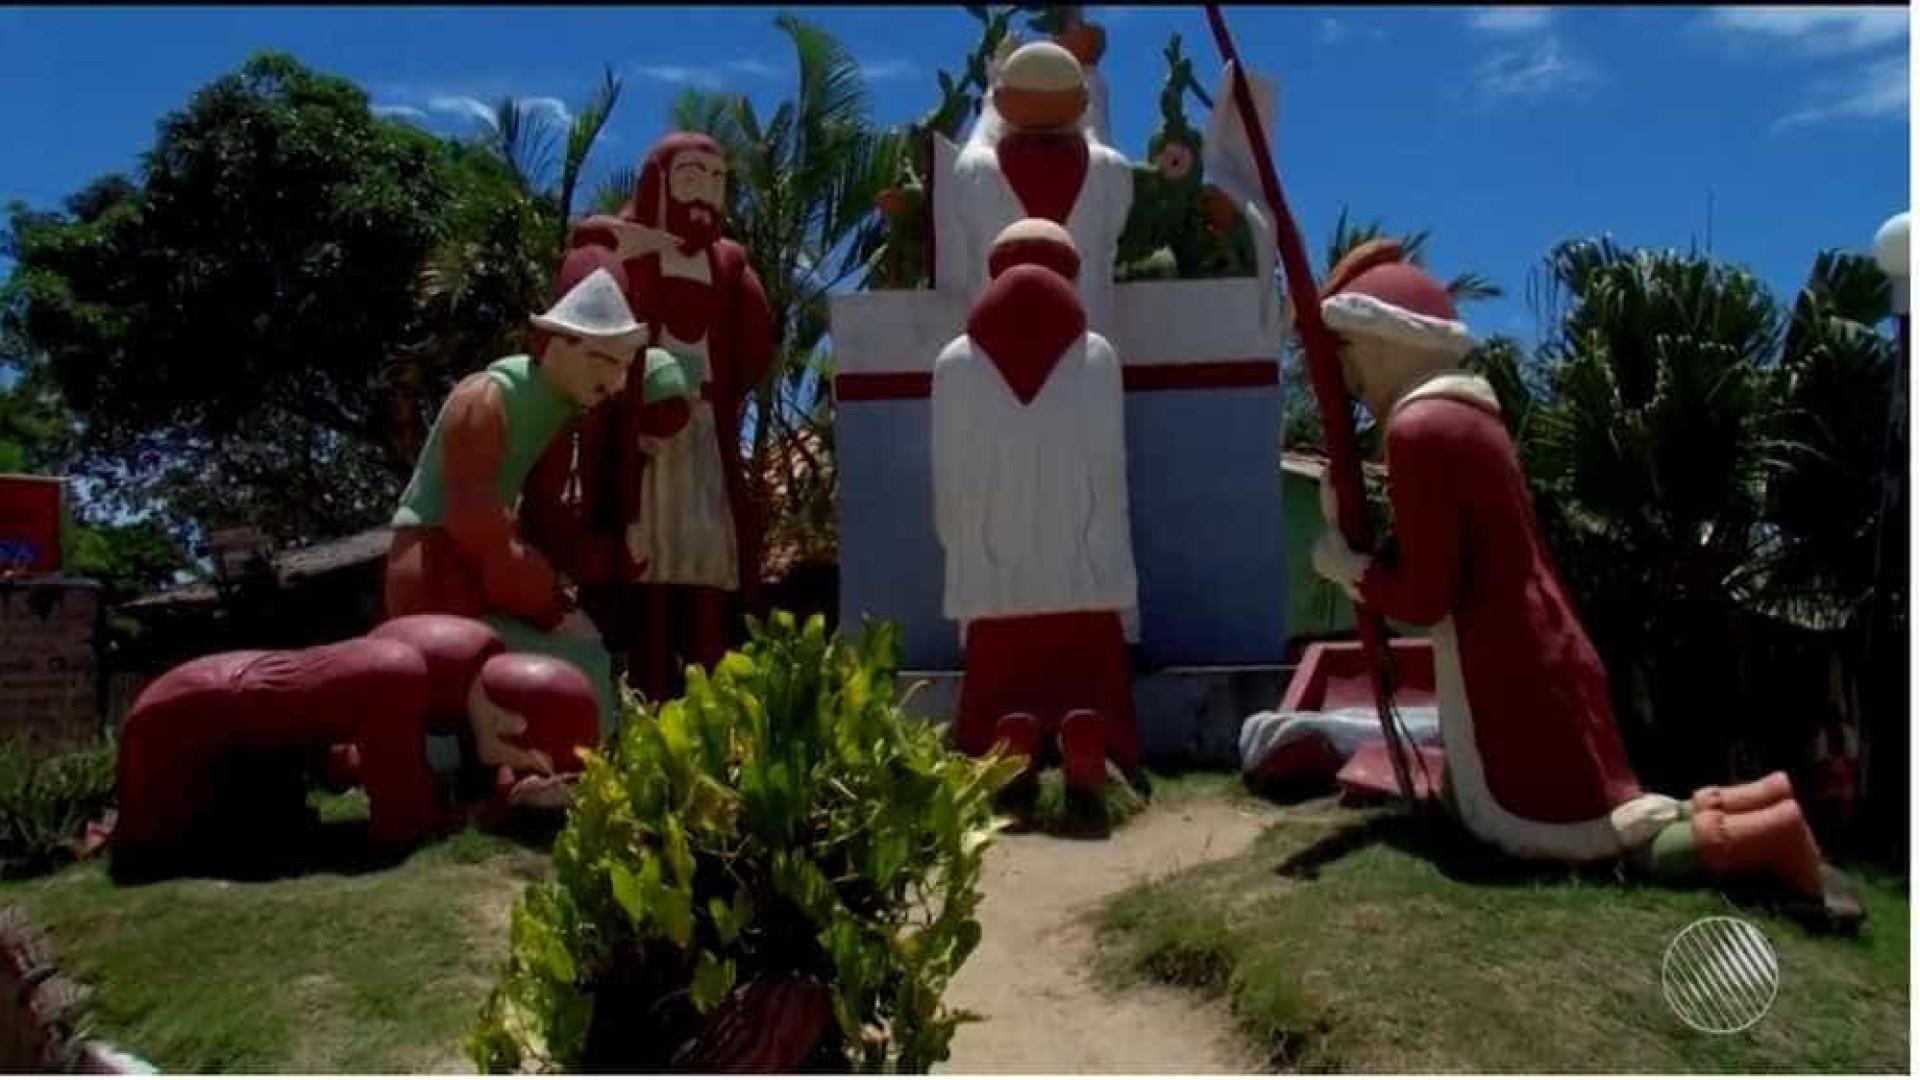 Monumento que representa 1ª missa celebrada no Brasil será demolido